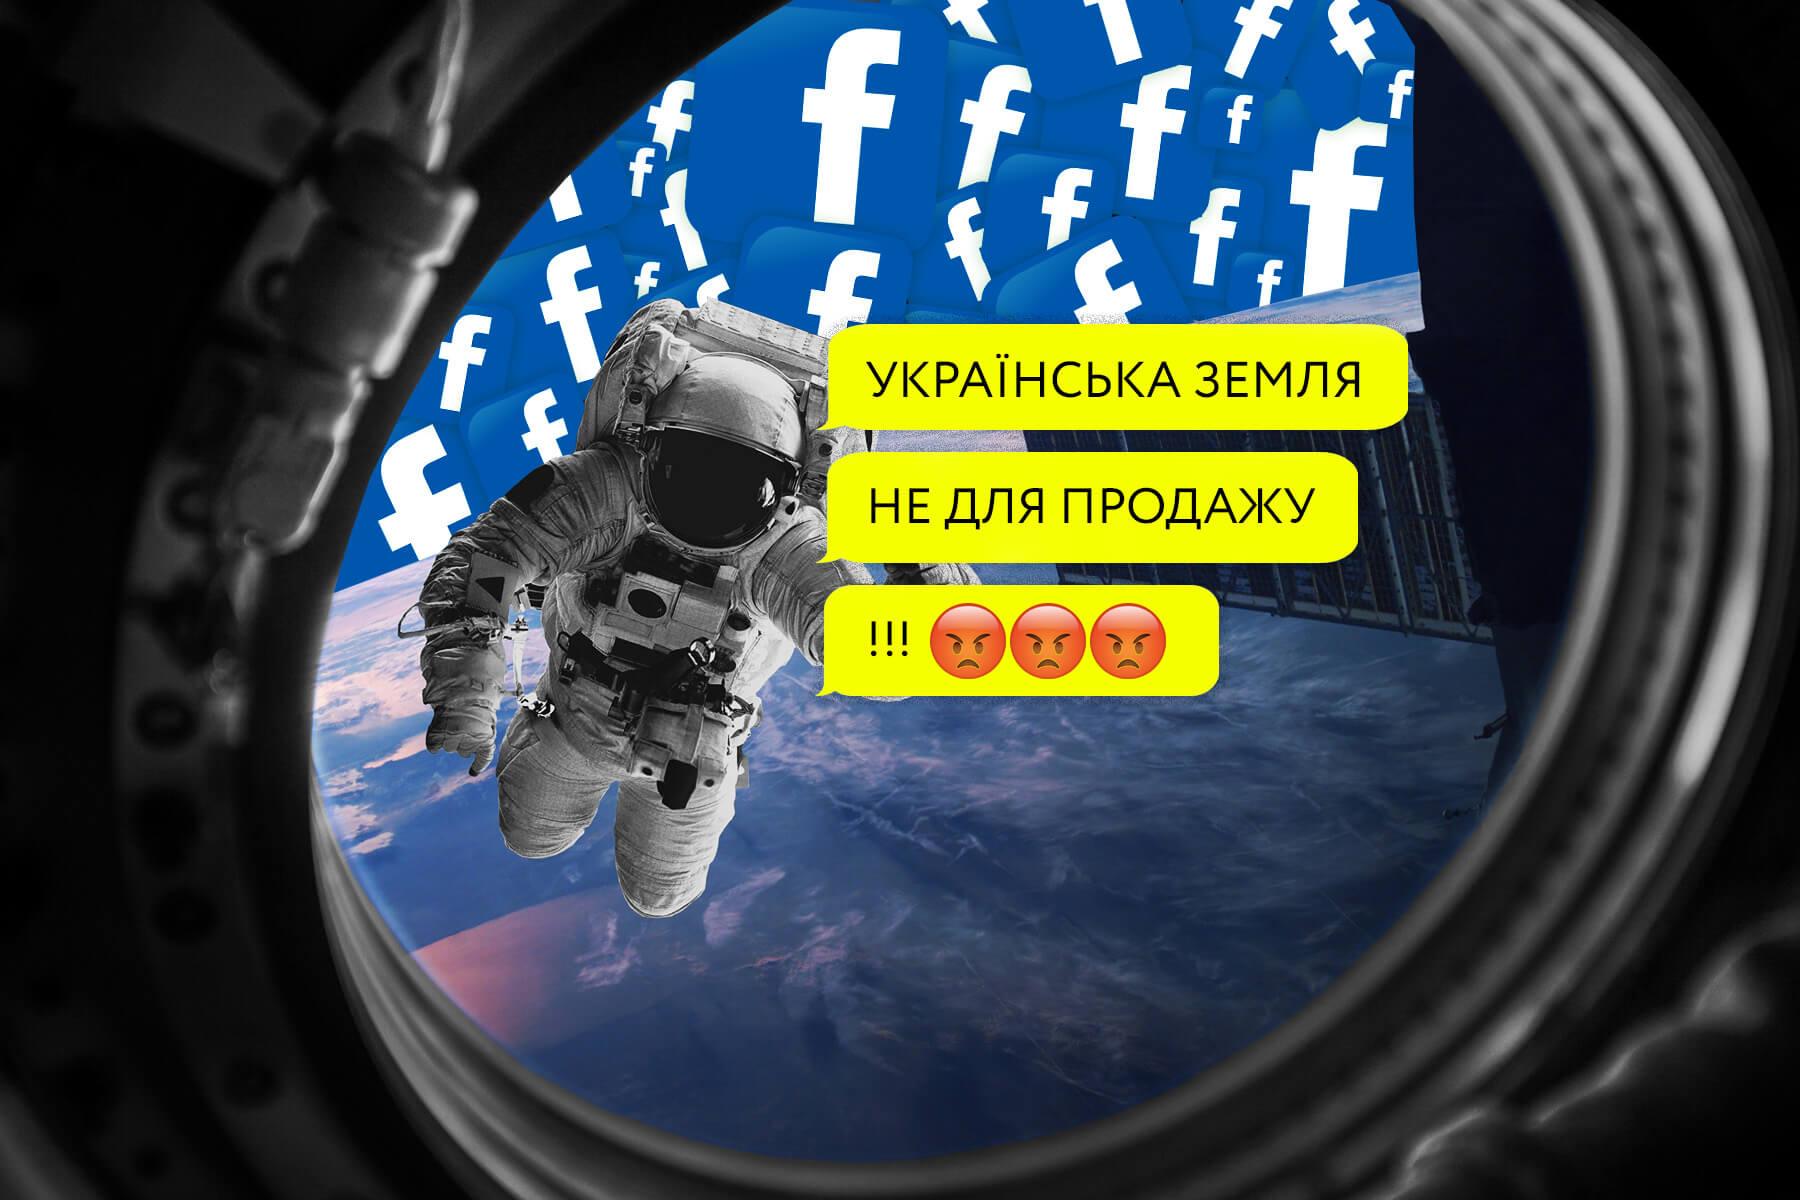 Facebook-гектар. Що пишуть депутати про земельну реформу